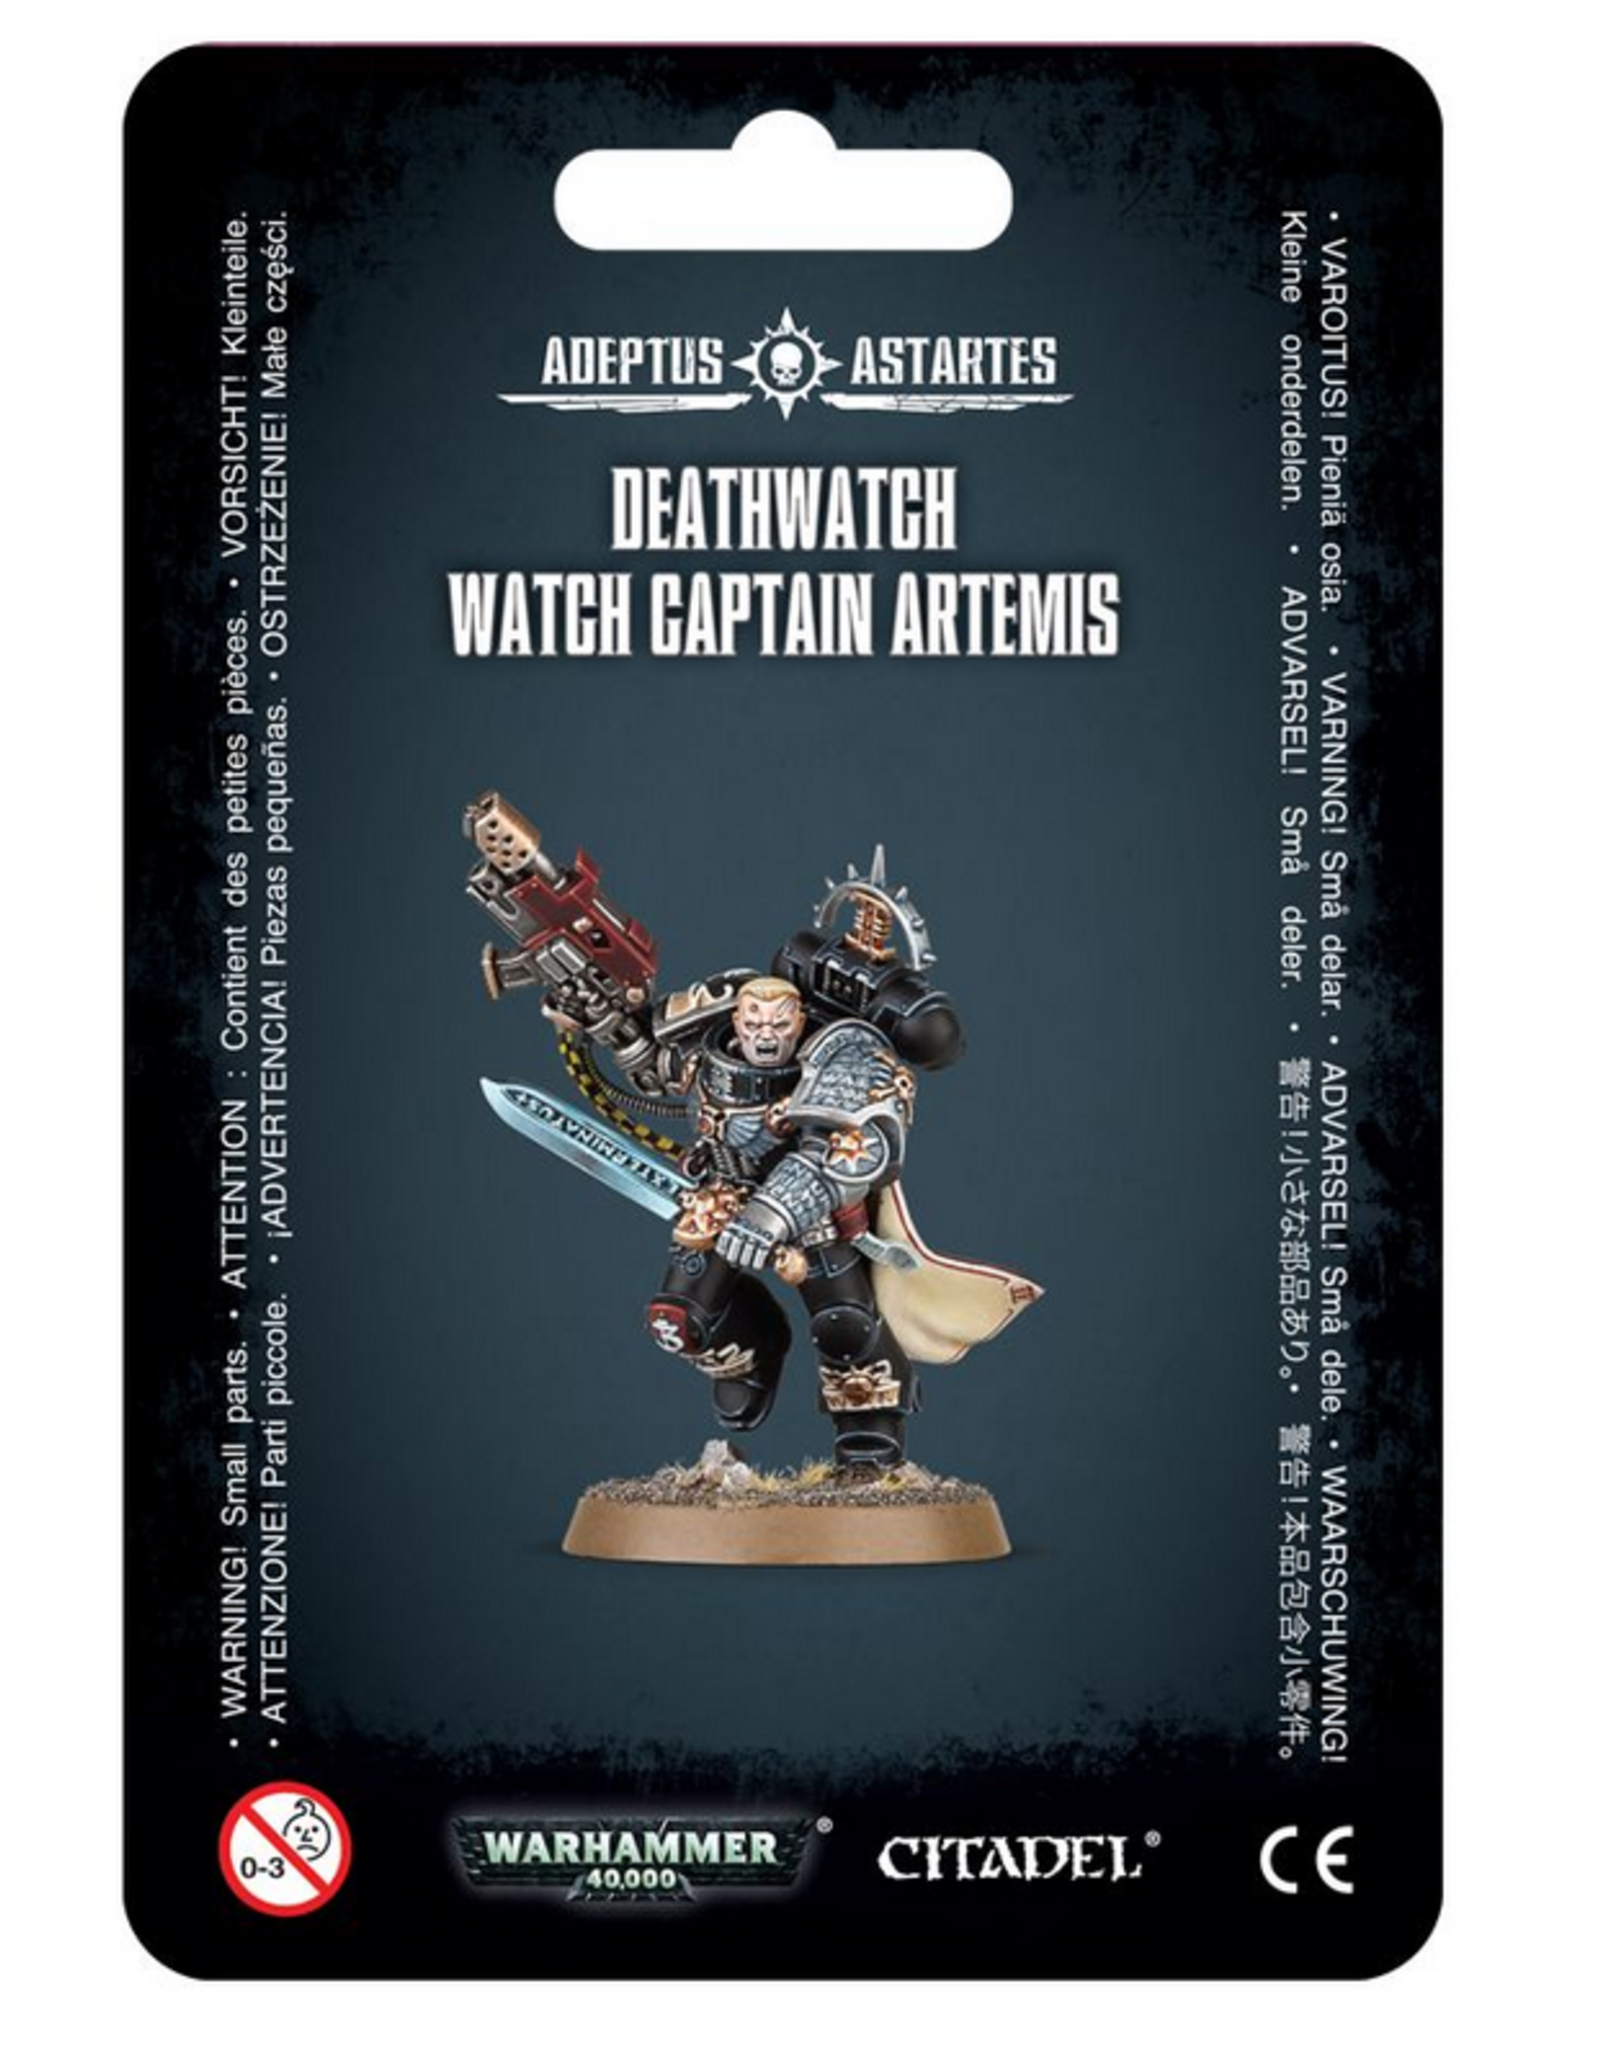 Games Workshop SM: Deathwatch Watch Captain Artemis